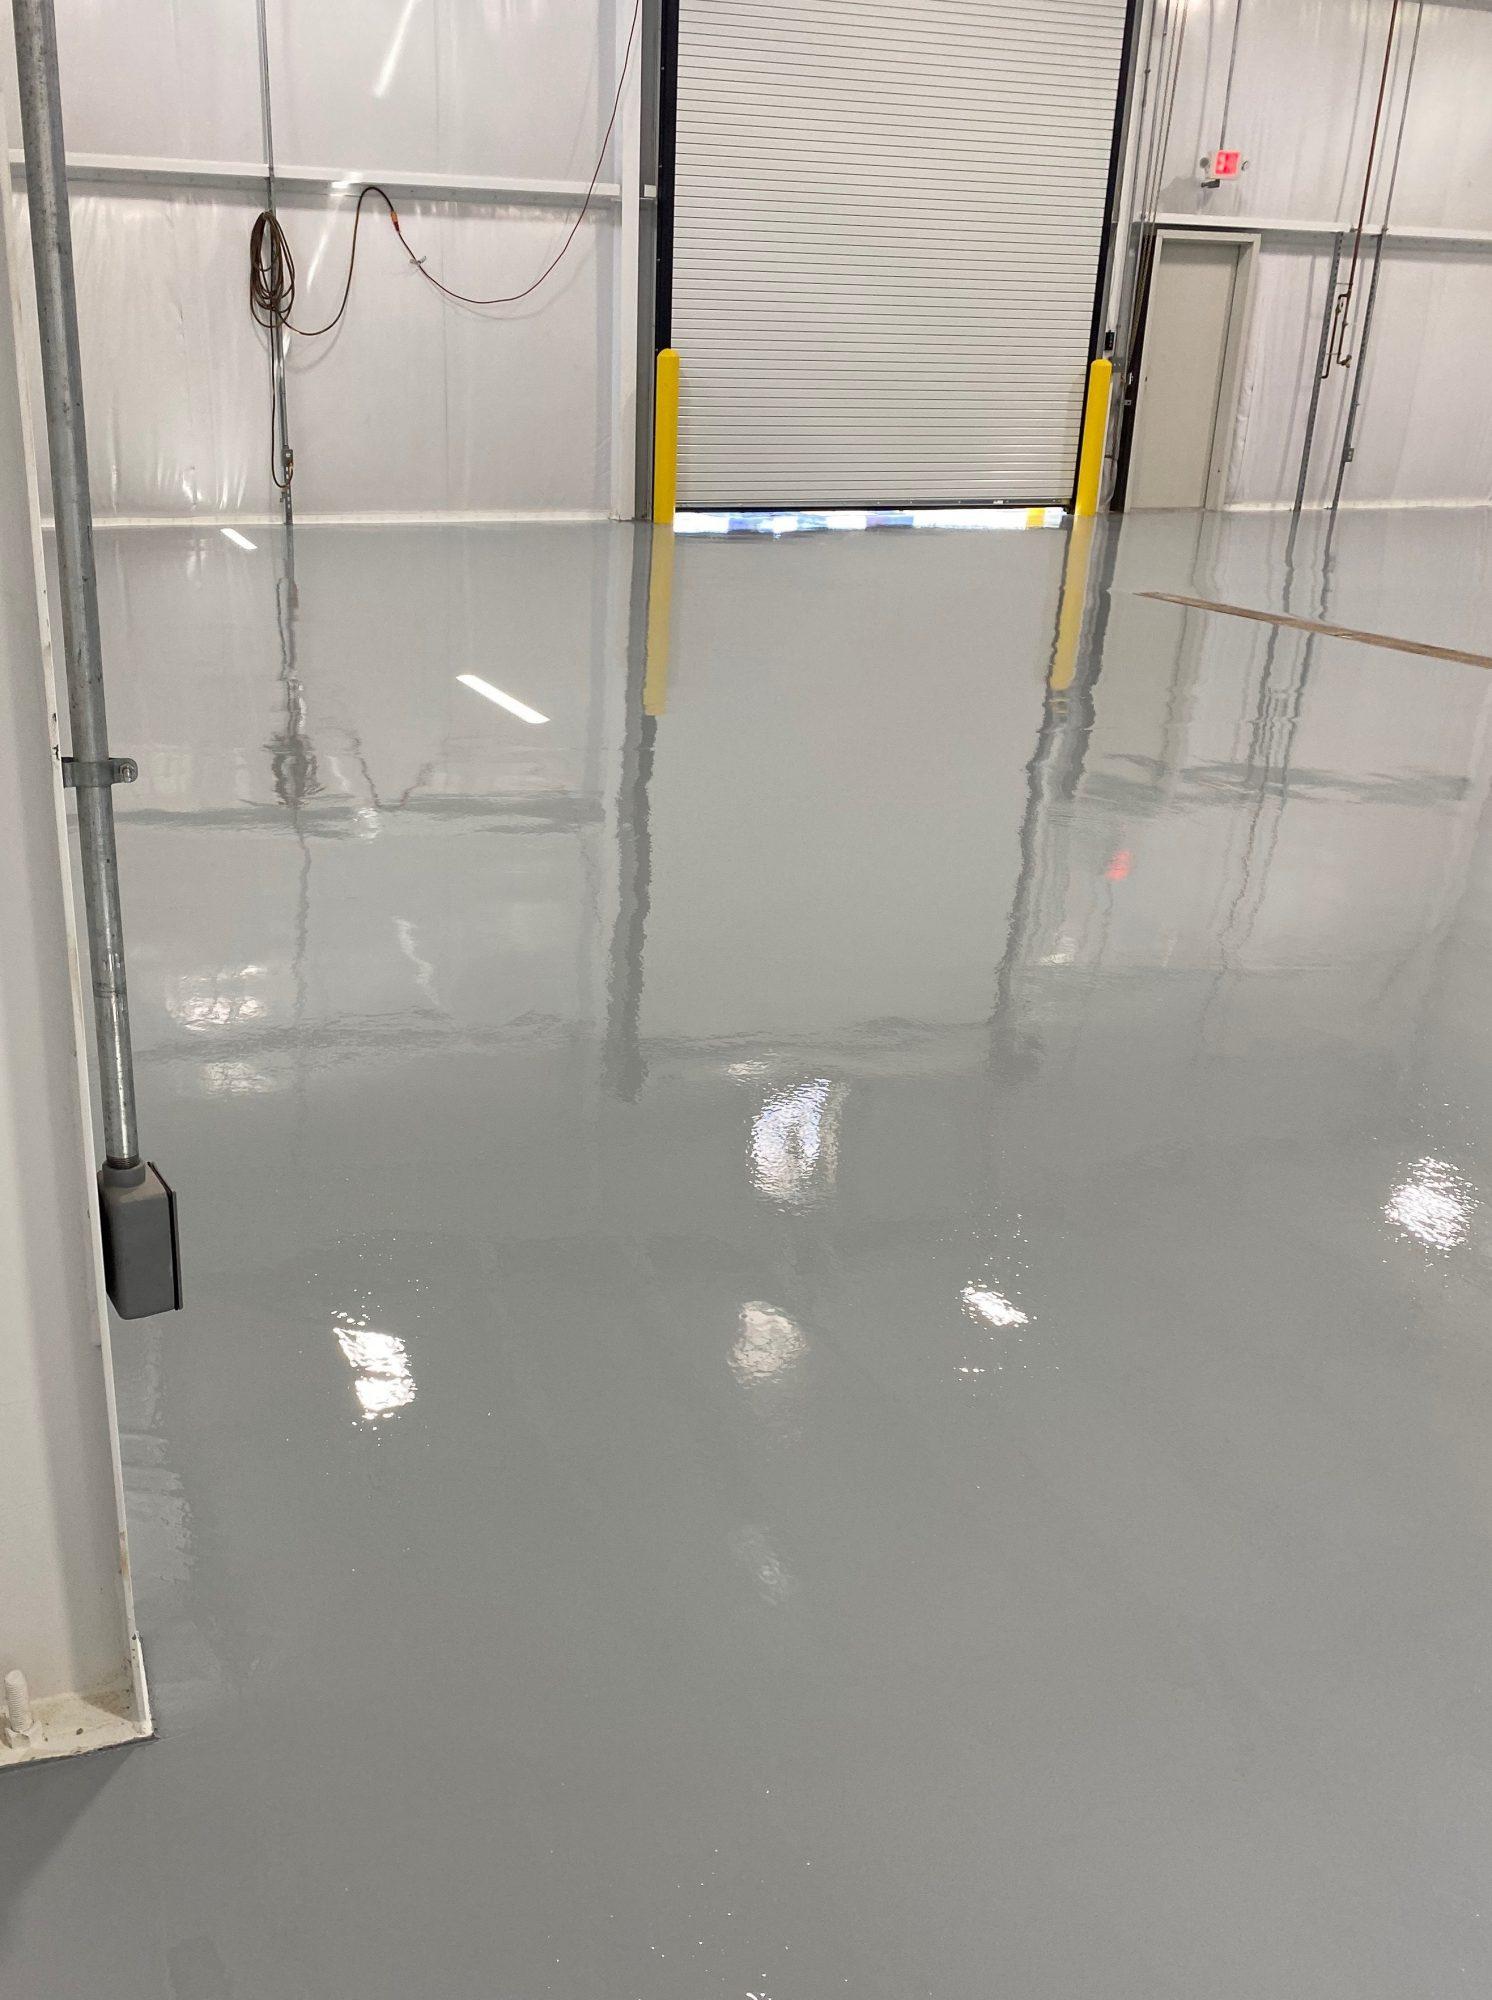 Epoxy floor coatings, epoxy mortar, epoxy coatings, epoxy flooring systems, Industrial Applications Inc, TeamIA, IA30yrs